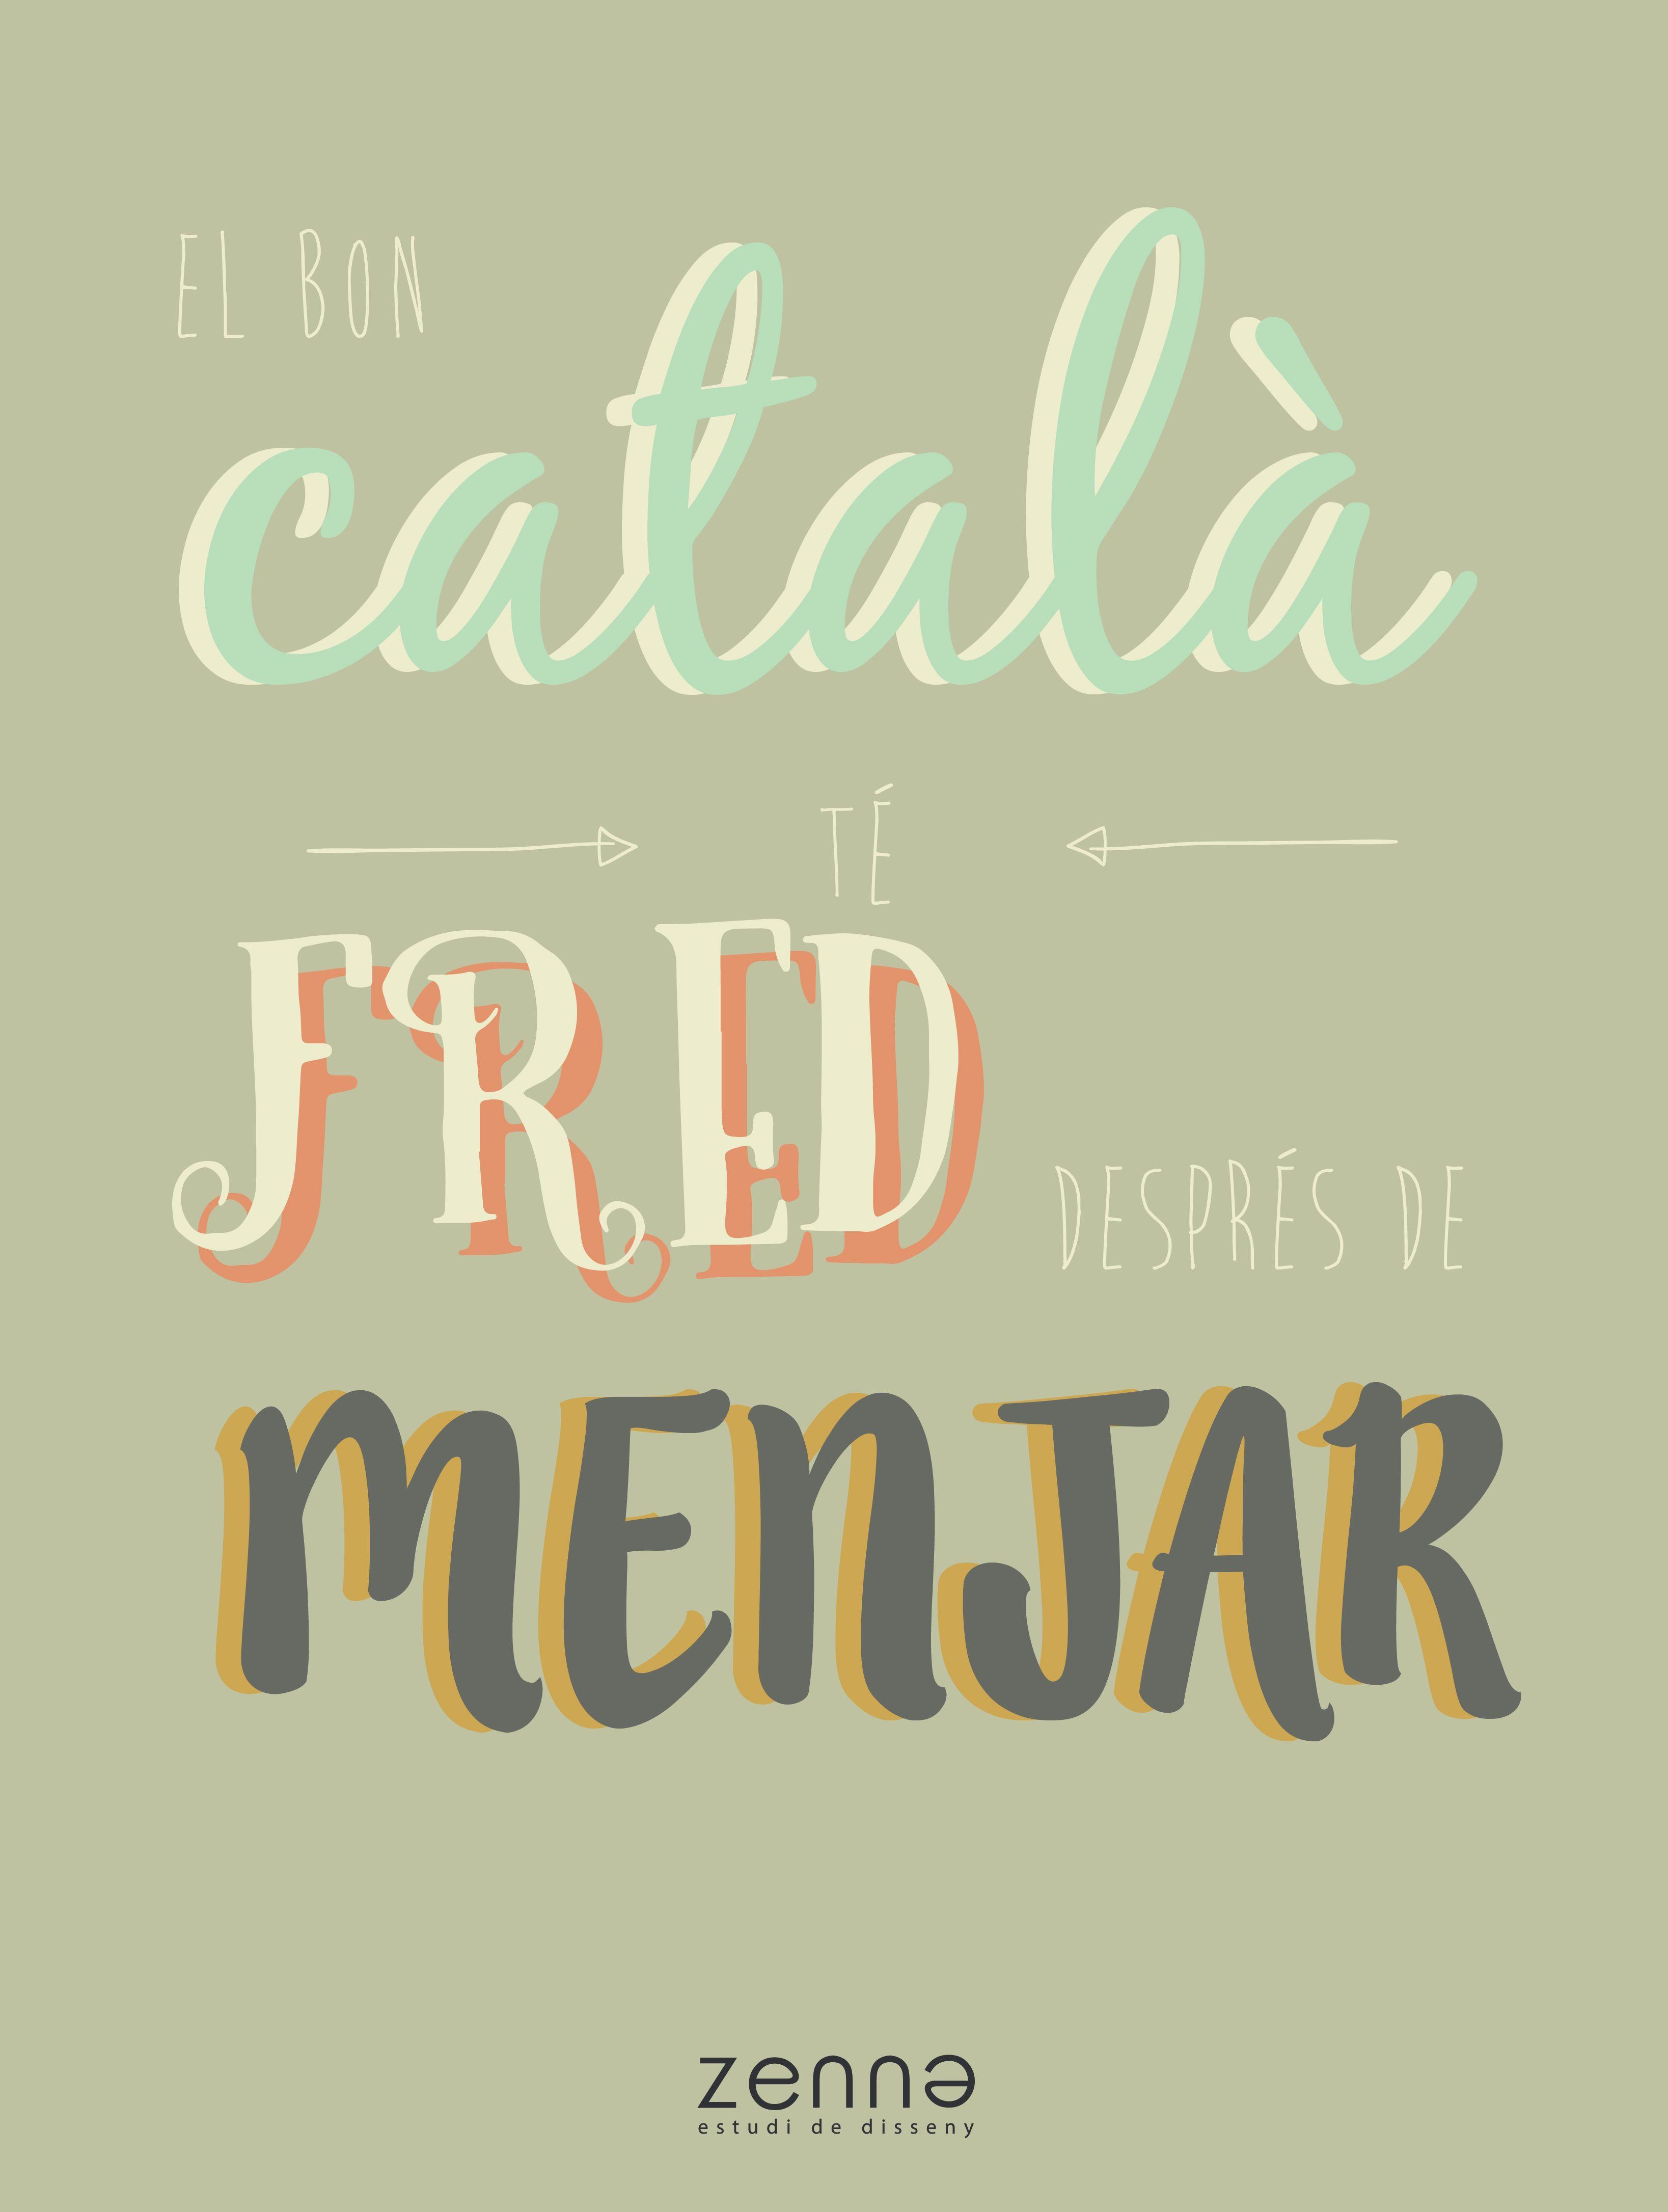 Vinilo Decorativo Frases En Cataln Qui Busqui L39infinit Que Tanqui